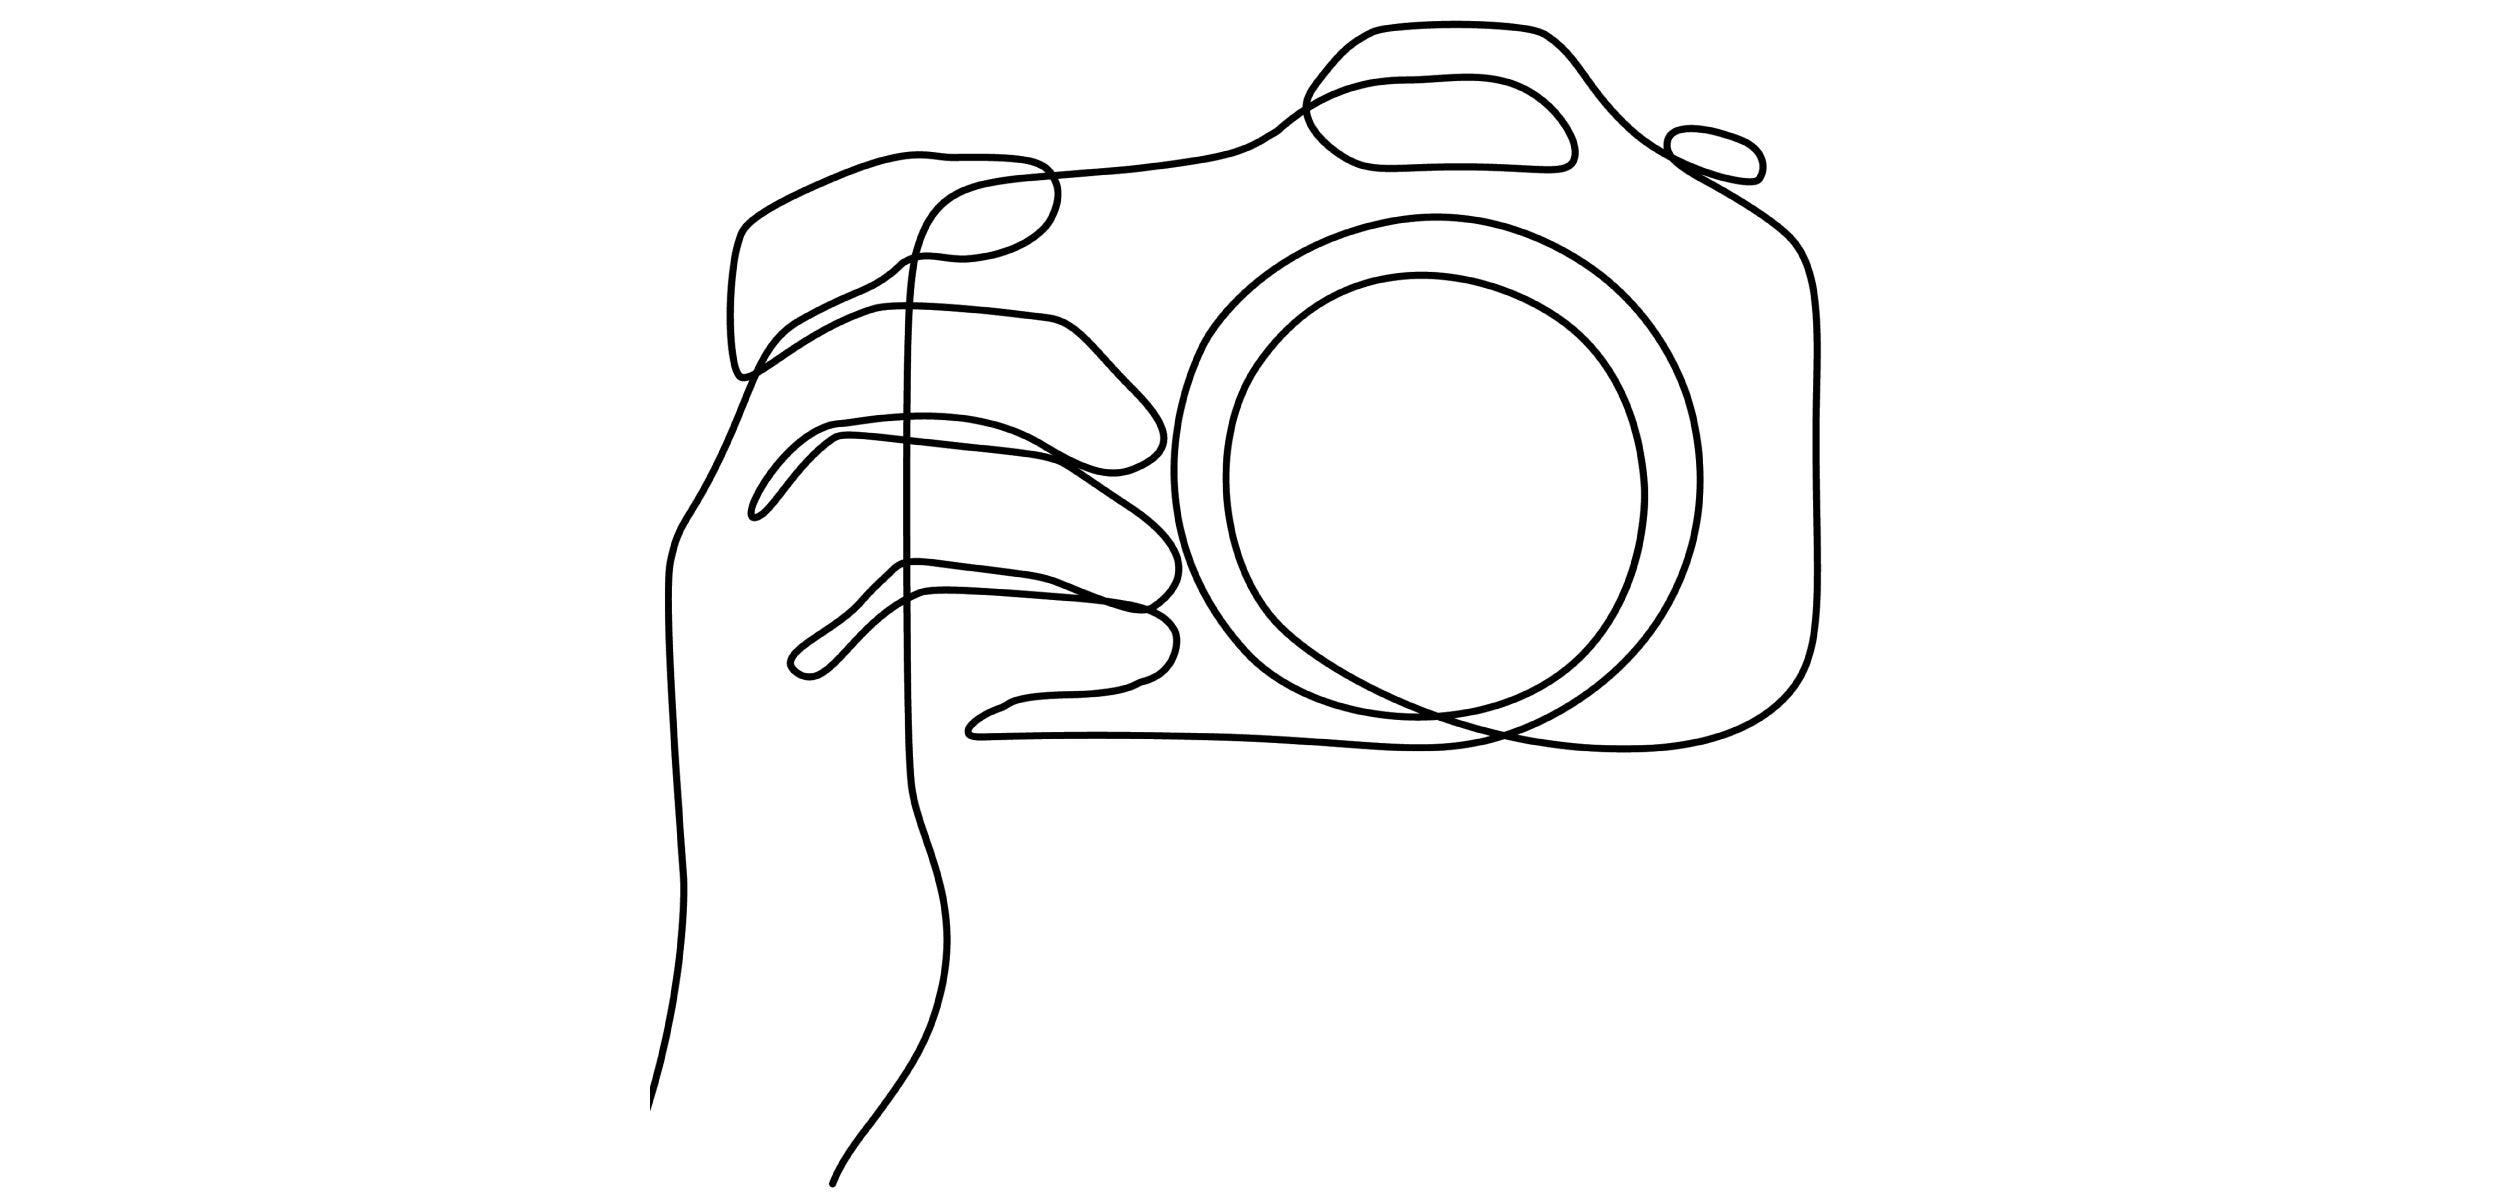 Sketch of a camera.